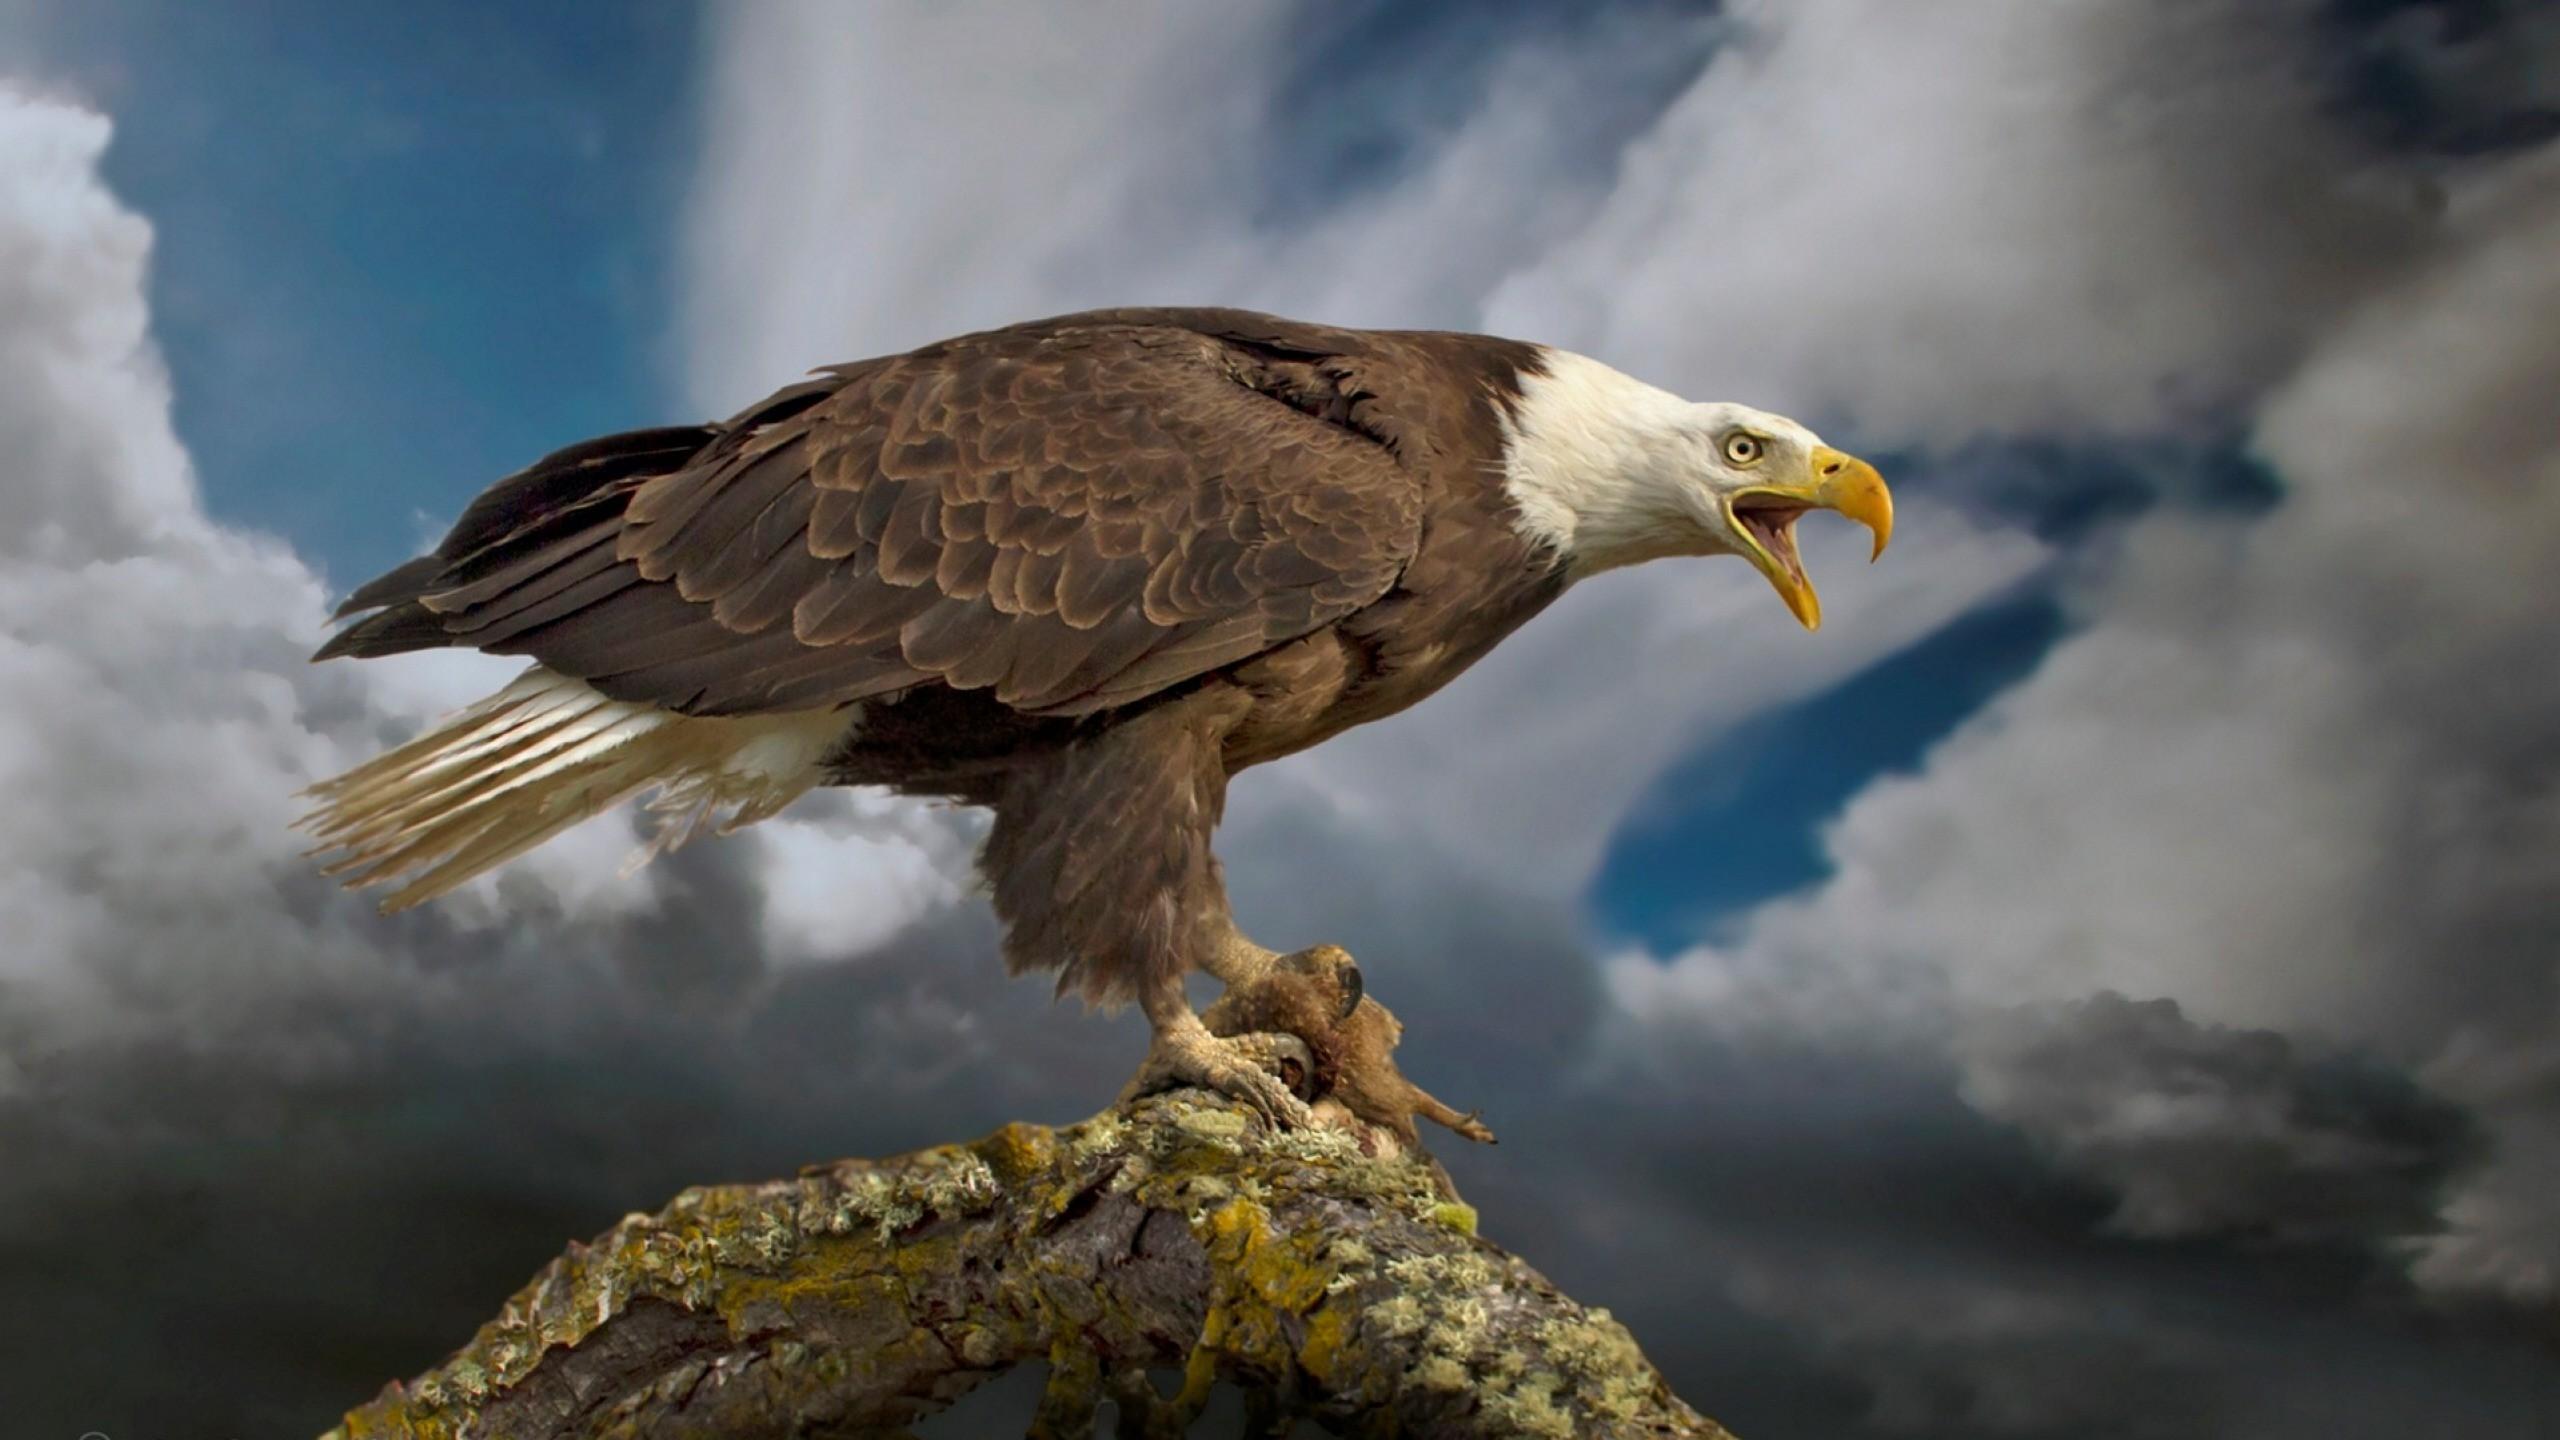 Mirabelle Mcguane, Patriotic Bald Eagle, 2560×1440